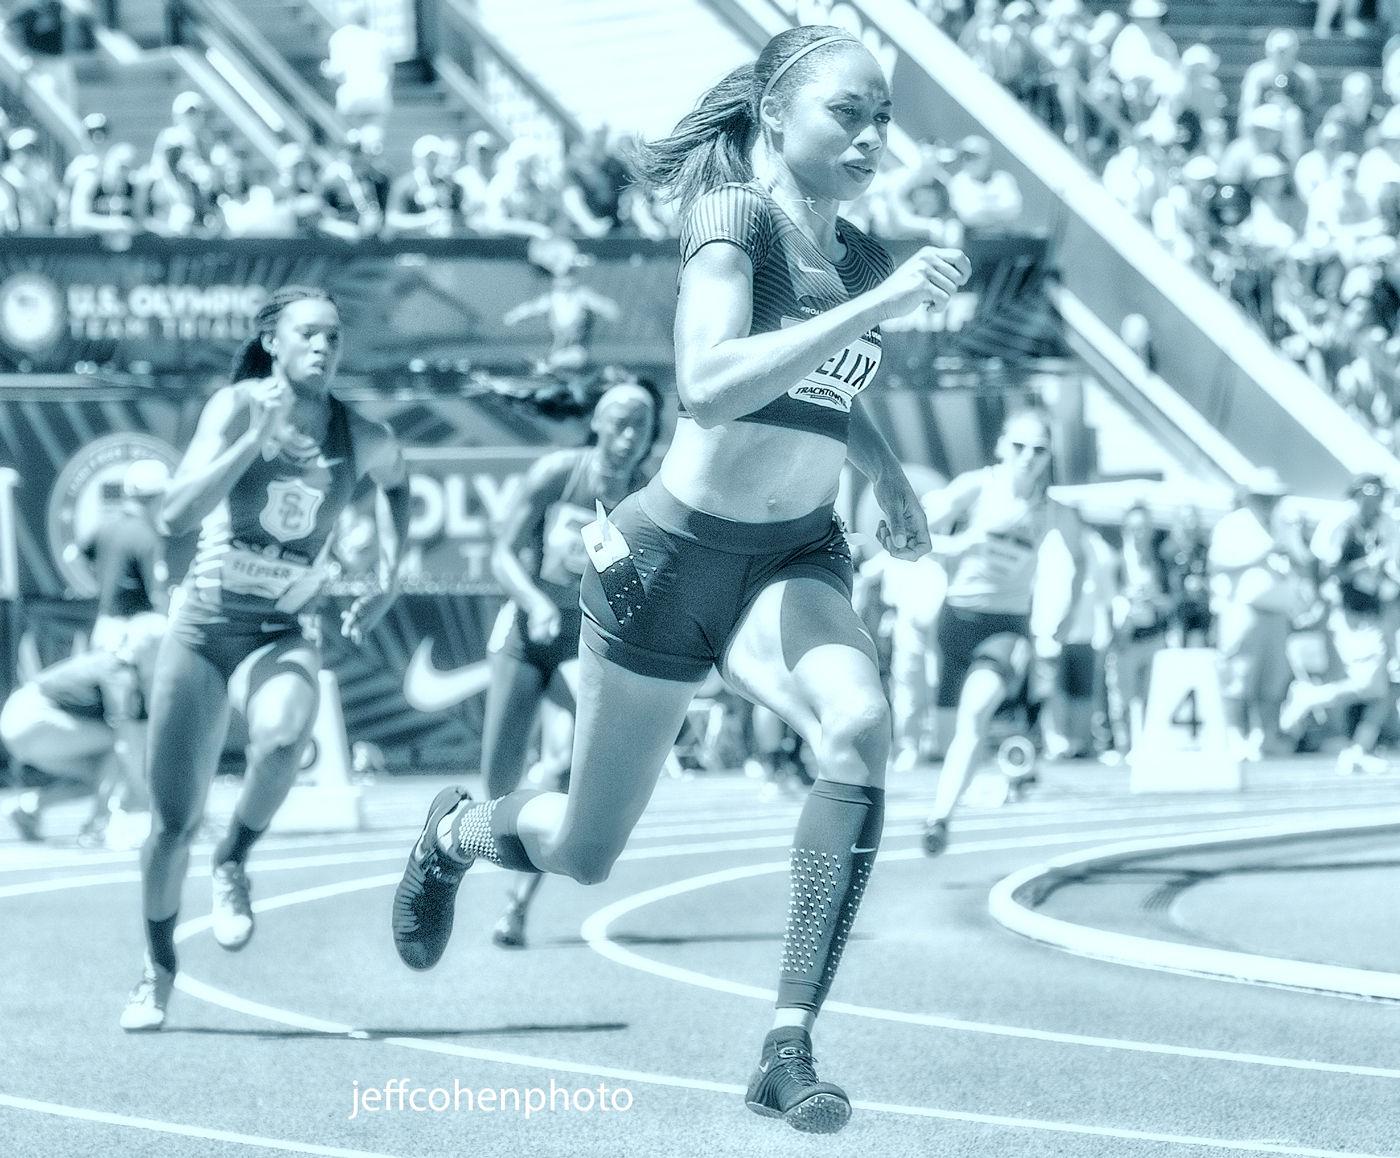 1r2016_oly_trials_day_2_allyson_felix_400_meters_jeff_cohen_photo_6905_web.jpg